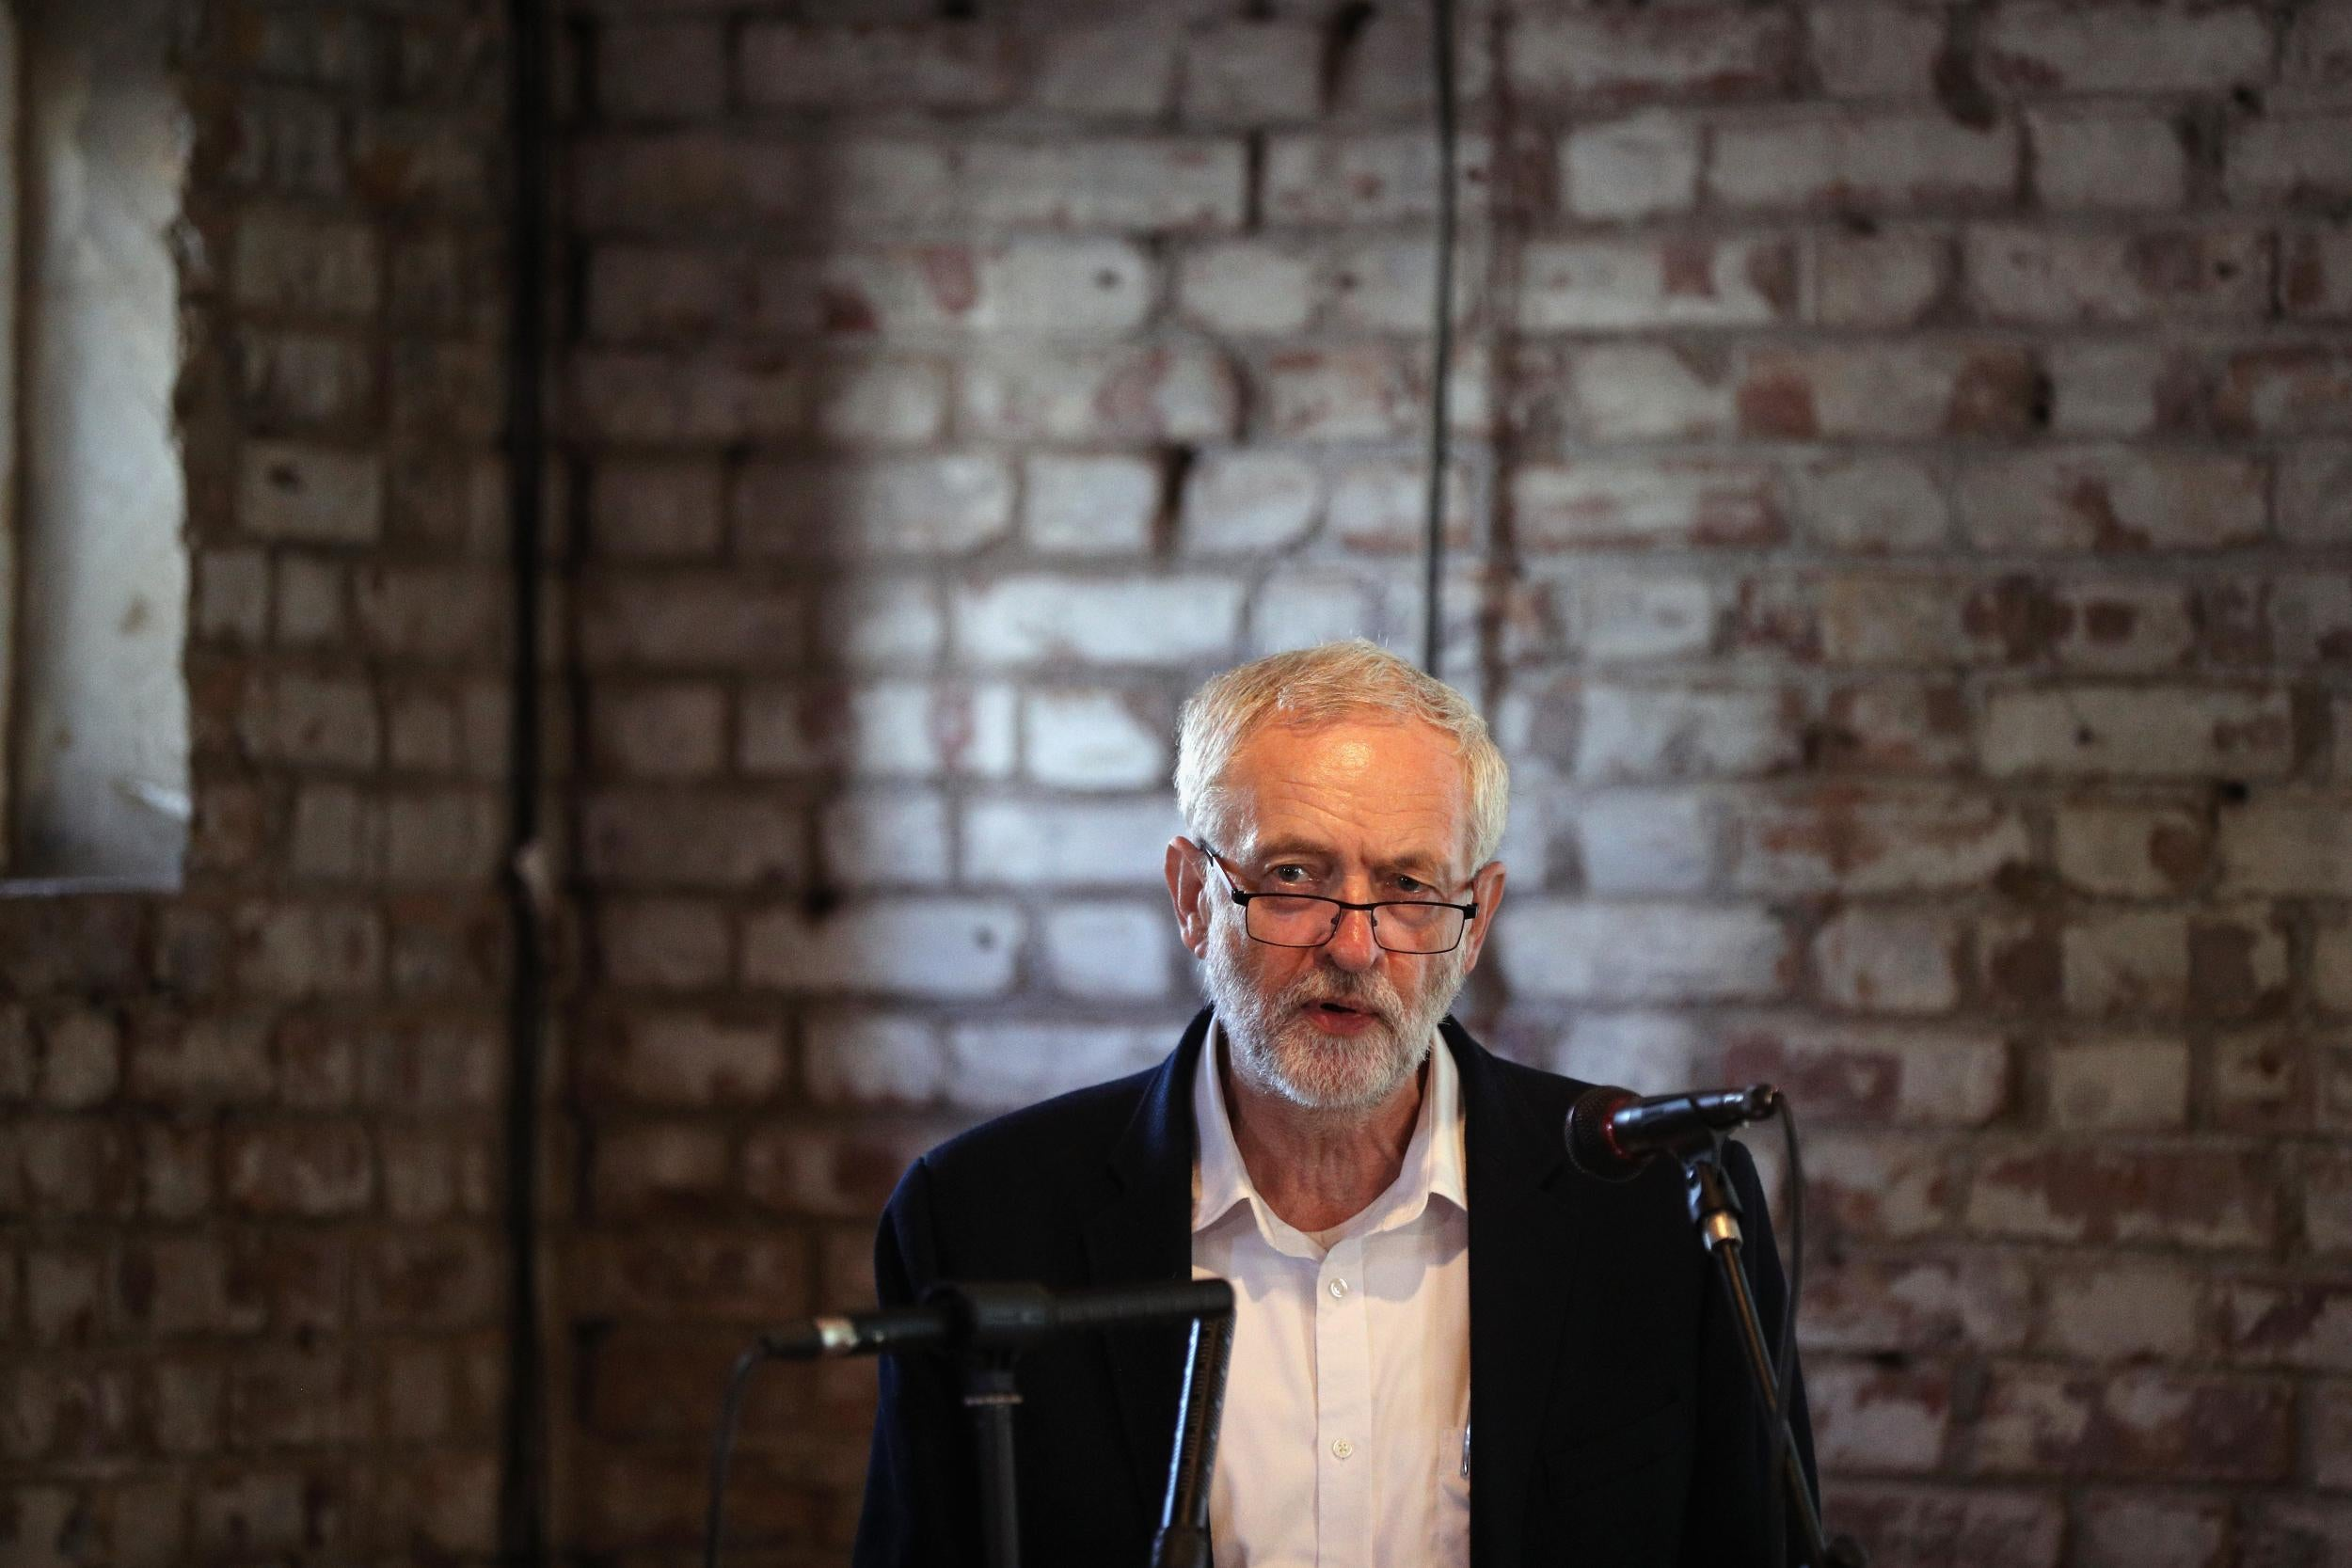 Jeremy Corbyn didn't radicalise me – Nick Clegg did